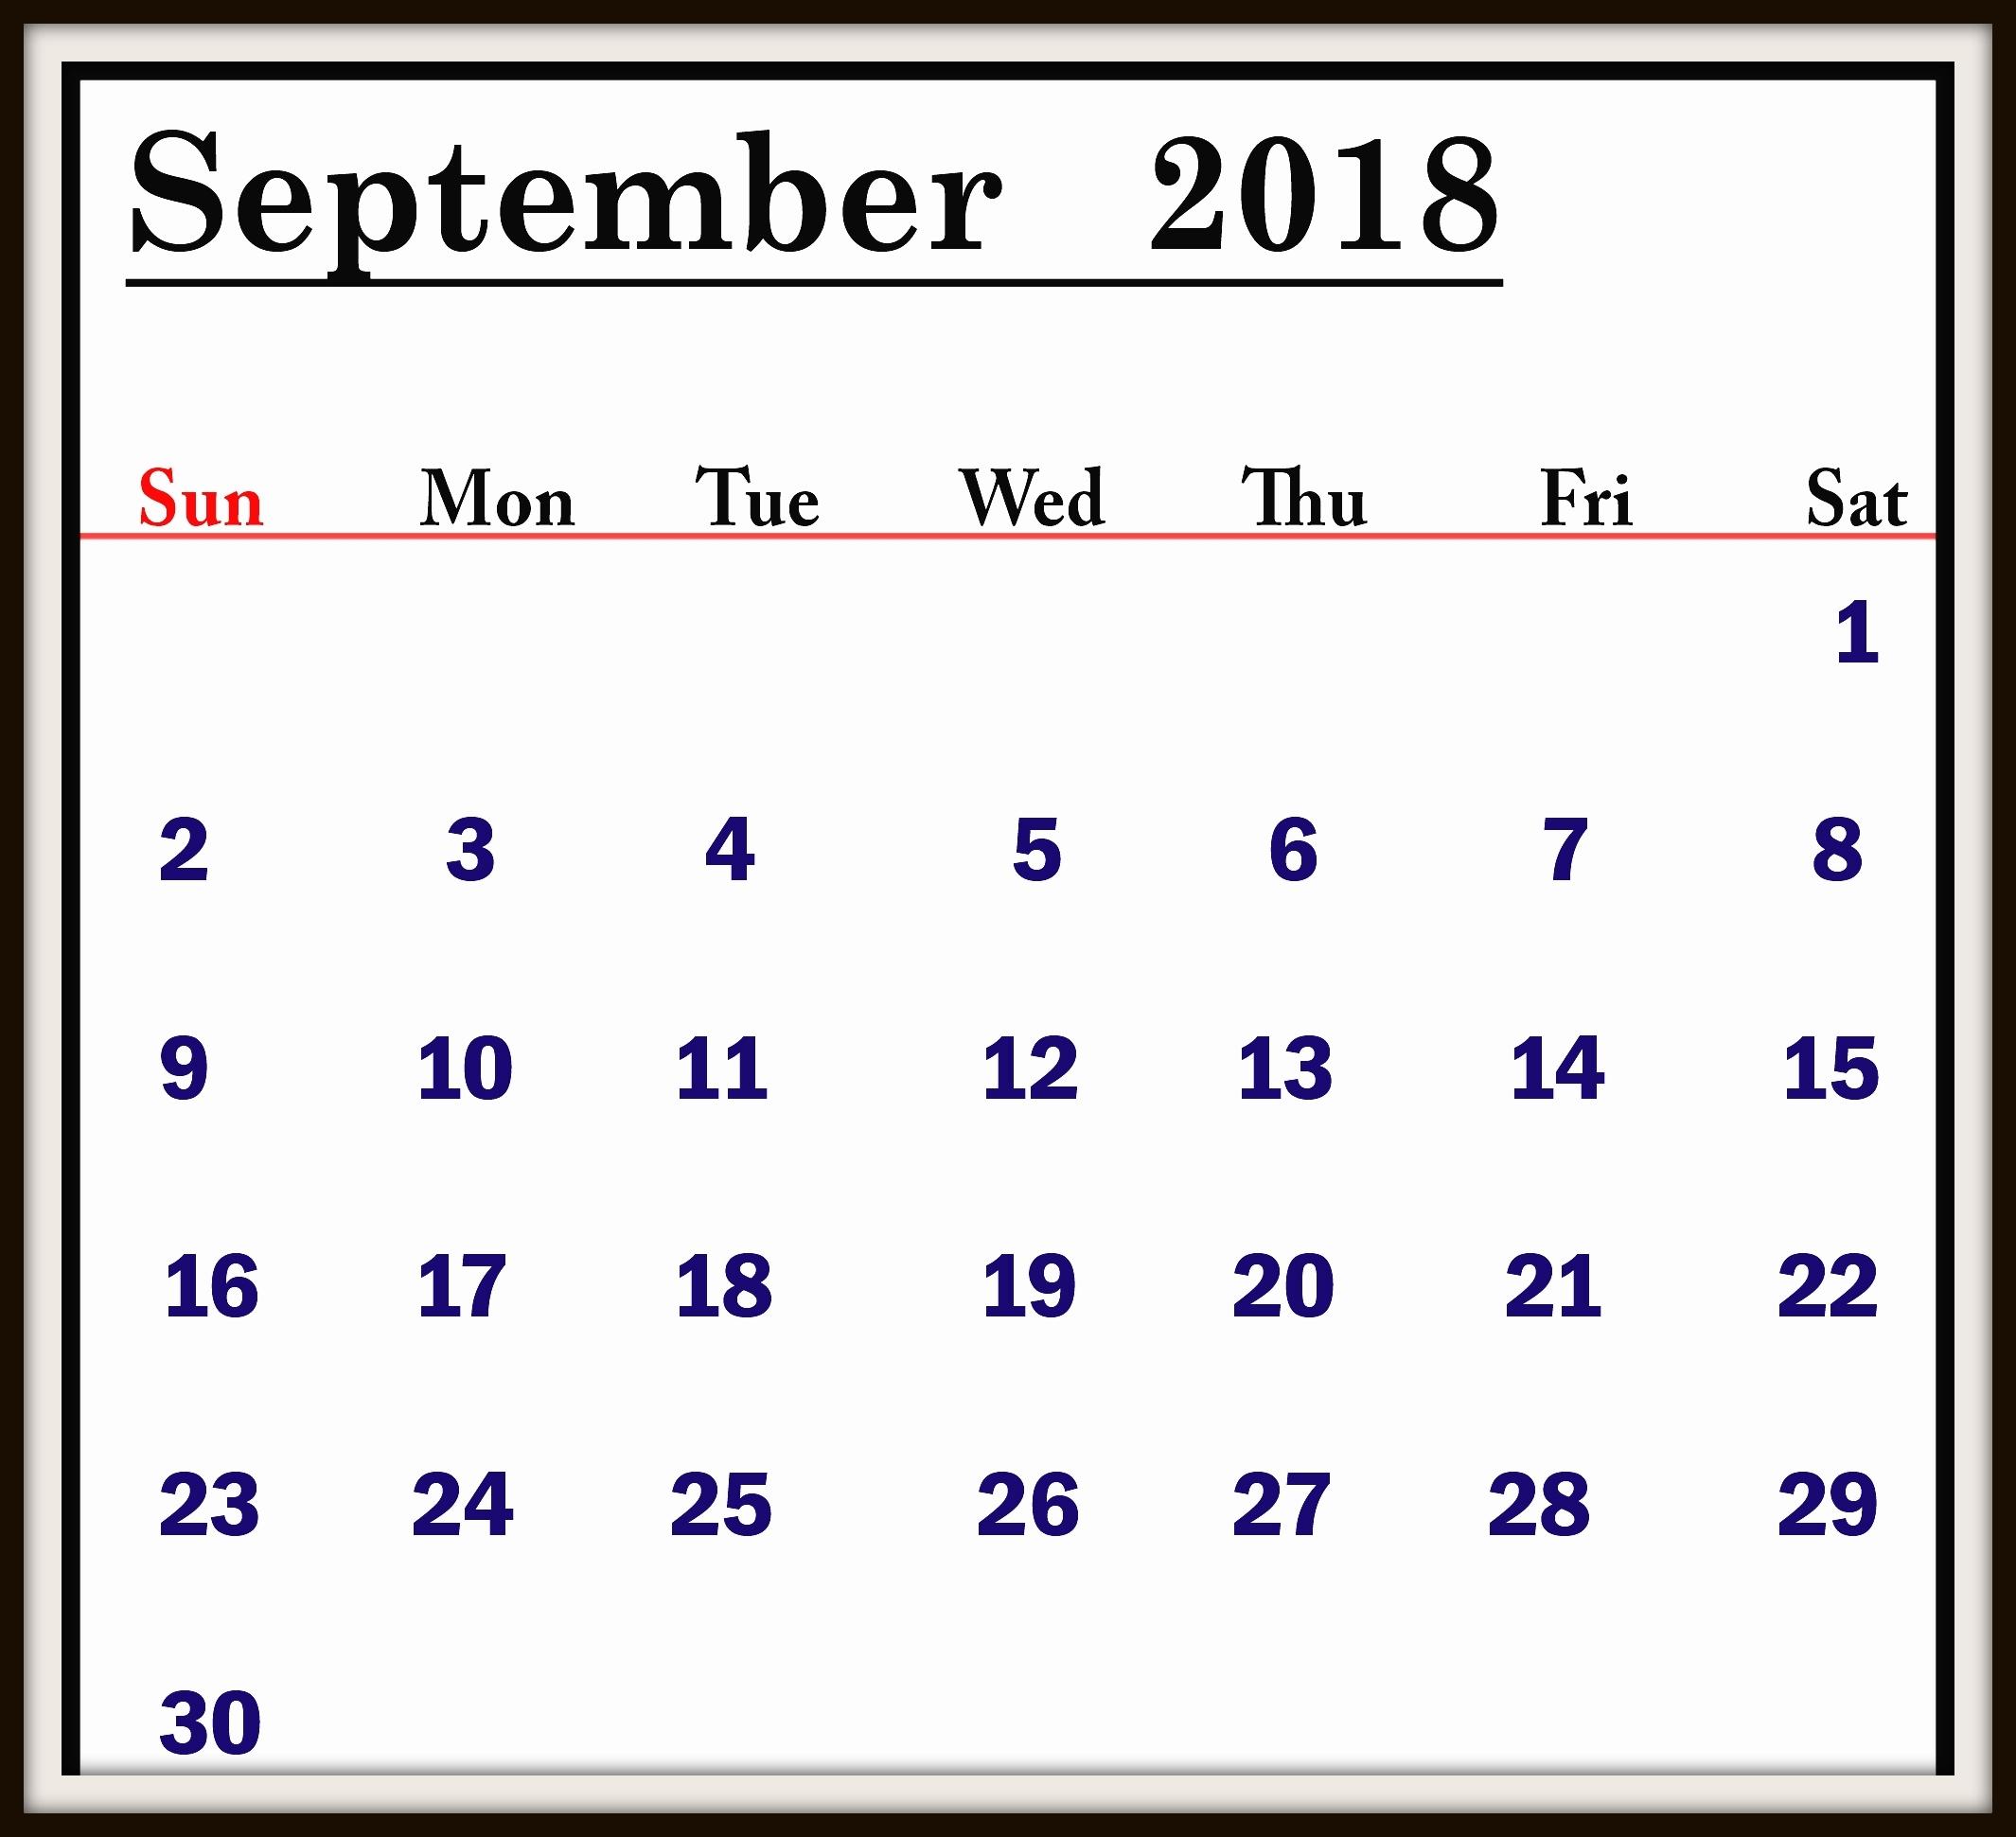 September 2018 Calendar Holidays